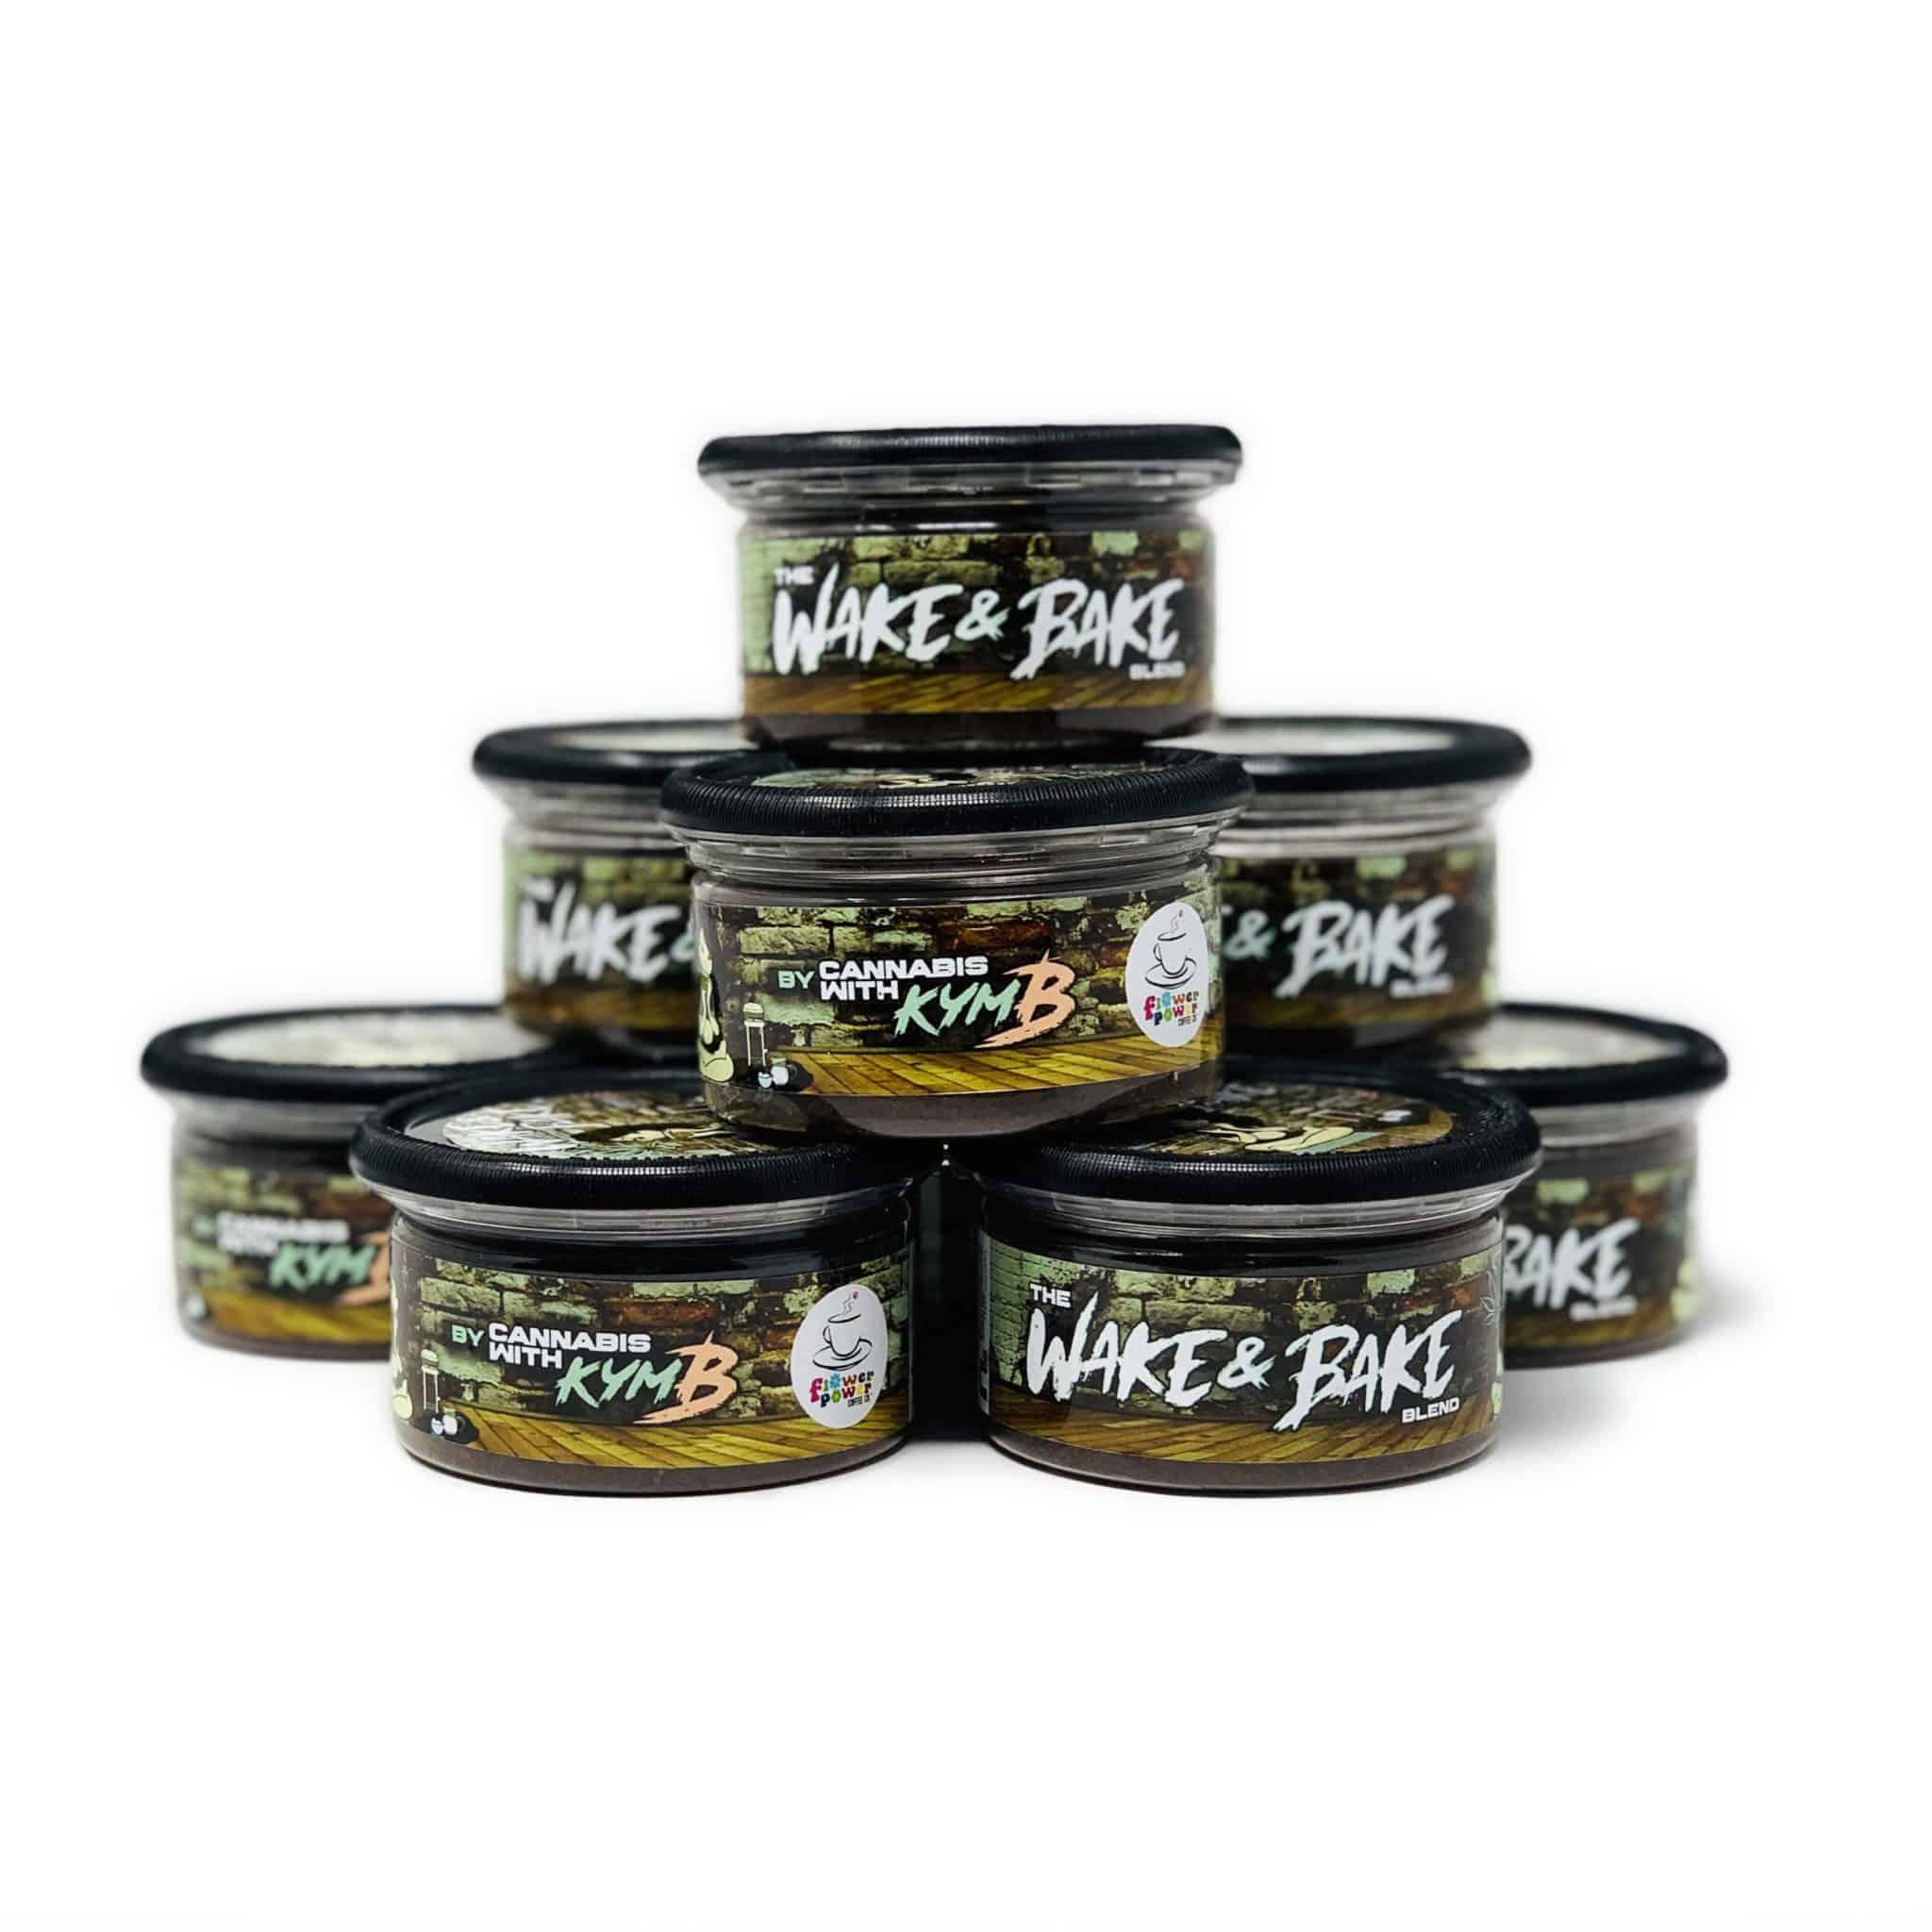 Wake & Bake CBD Coffee by CannabisWithKymB - 1 oz, 30 mg of CBD